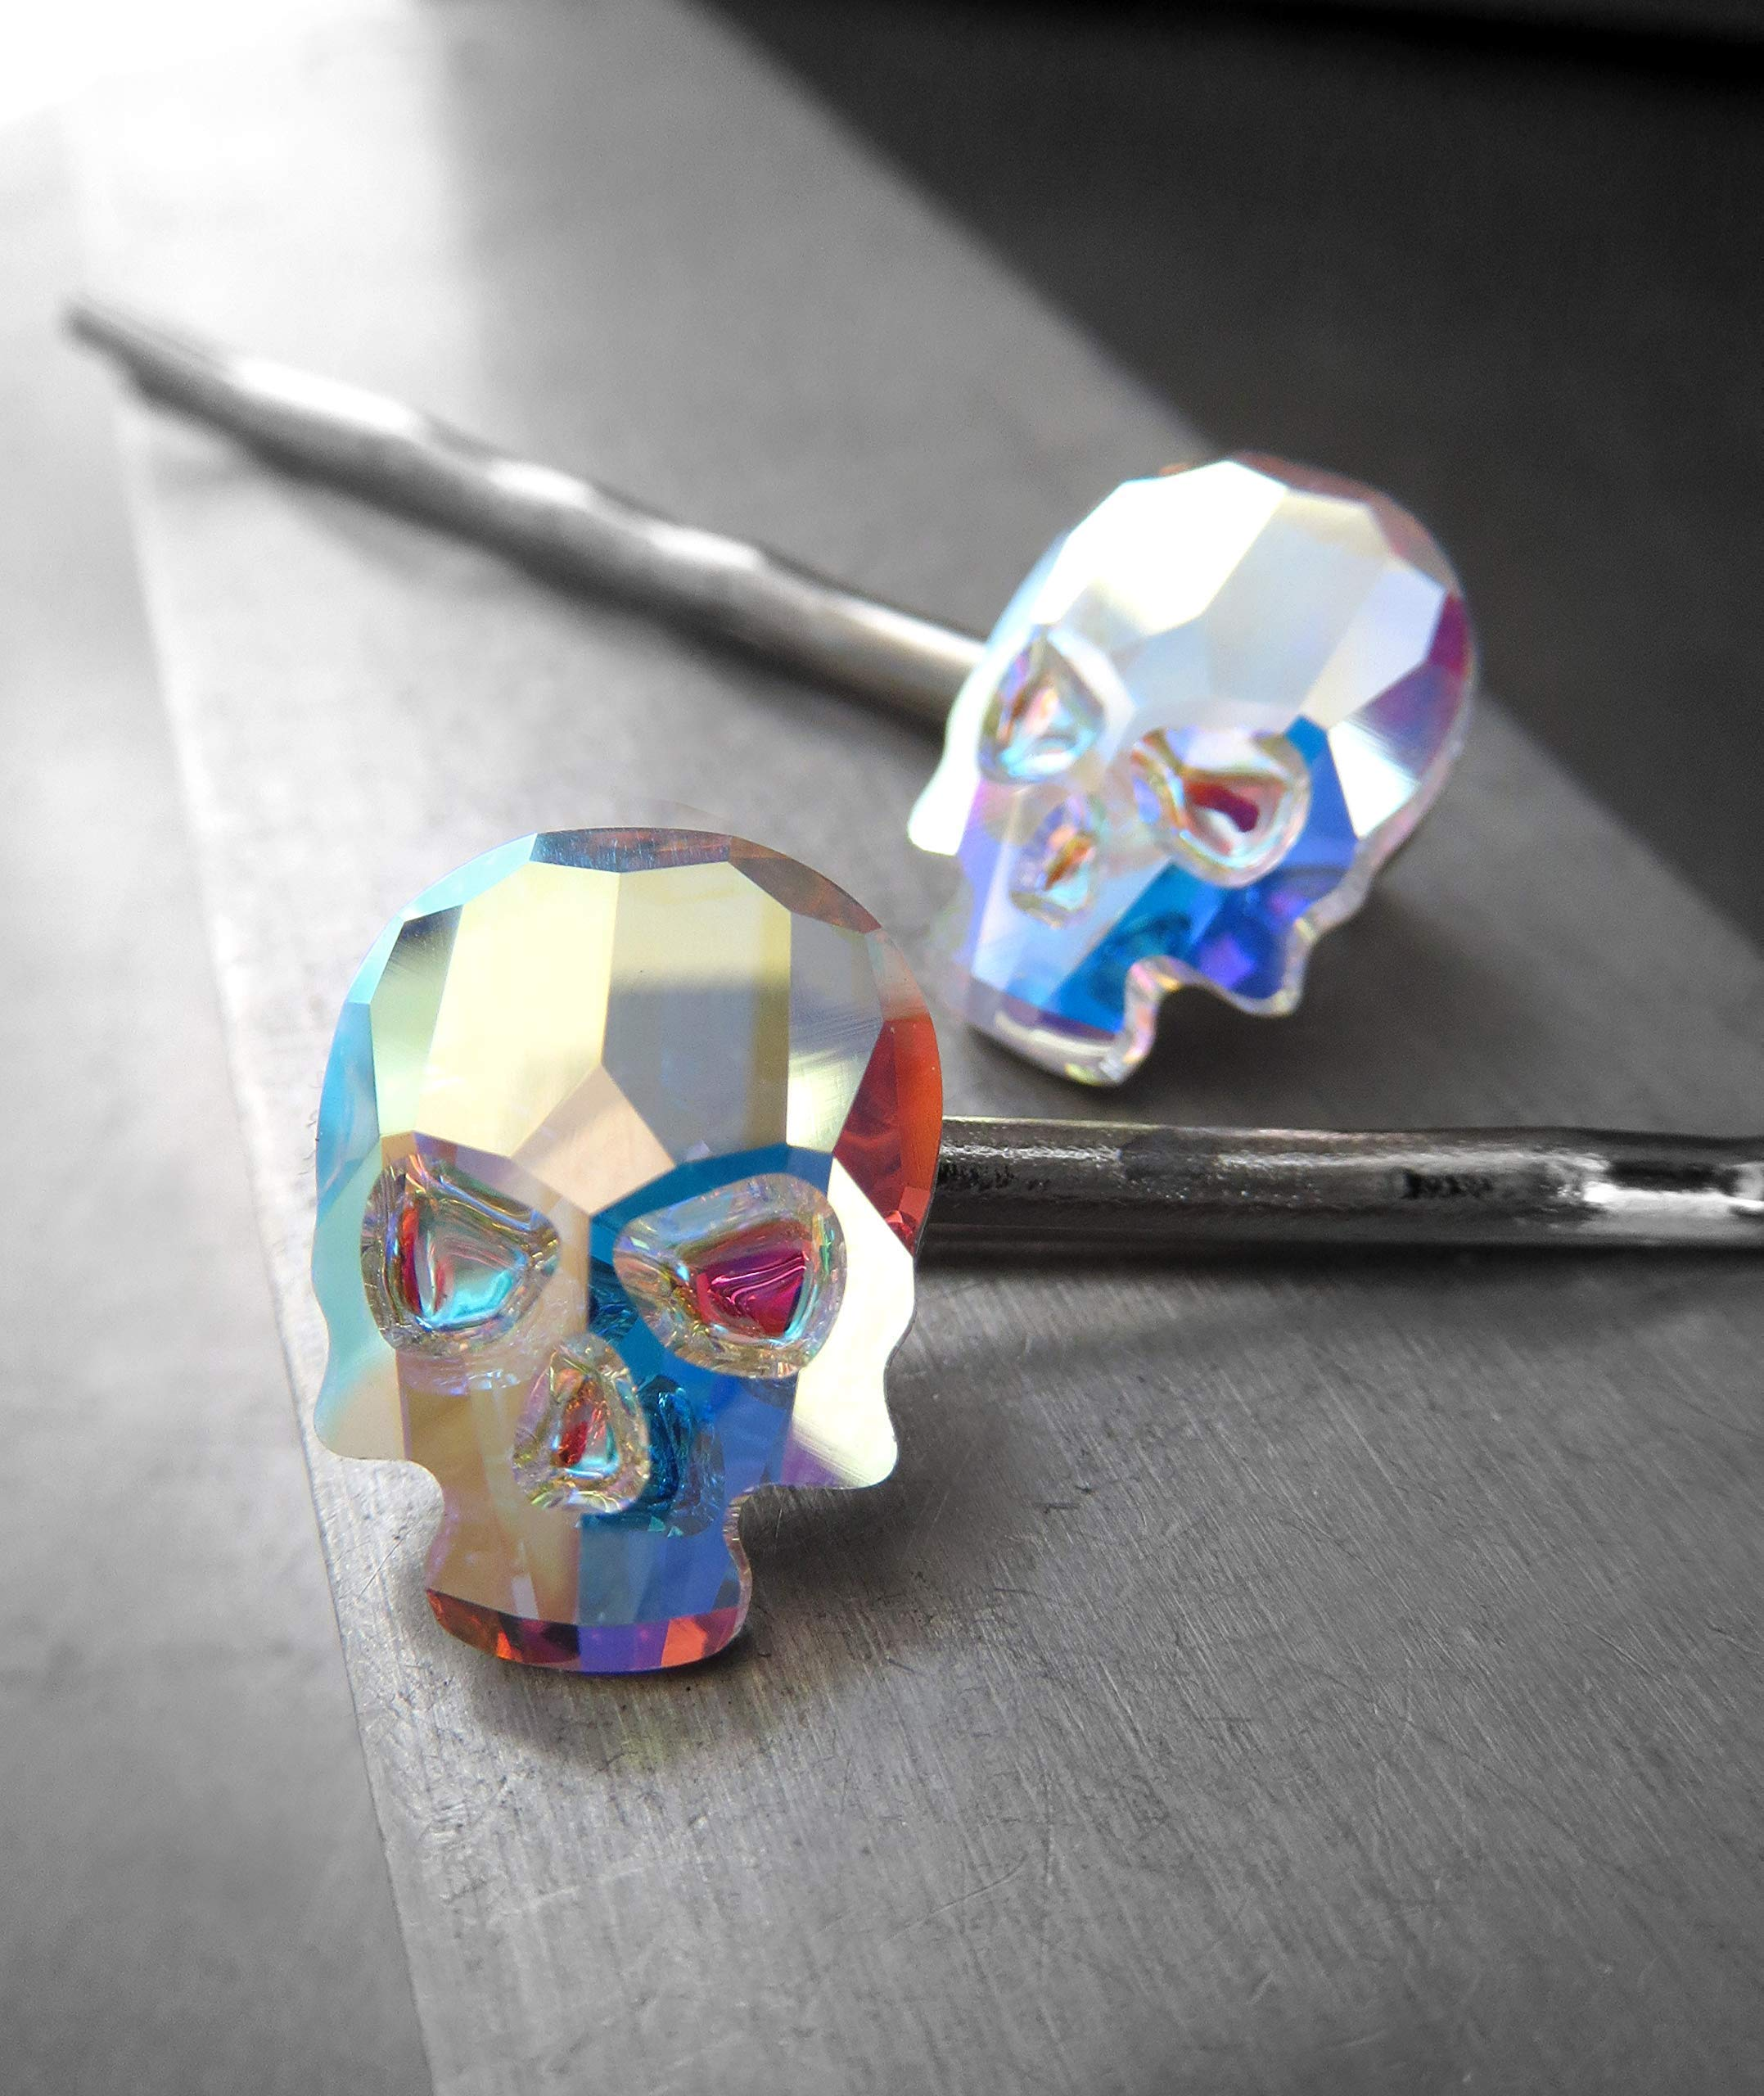 Iridescent Swarovski Crystal Skull Hair Pins in Crystal AB - Set of 2 - Fun Goth Girl Halloween Jewelry